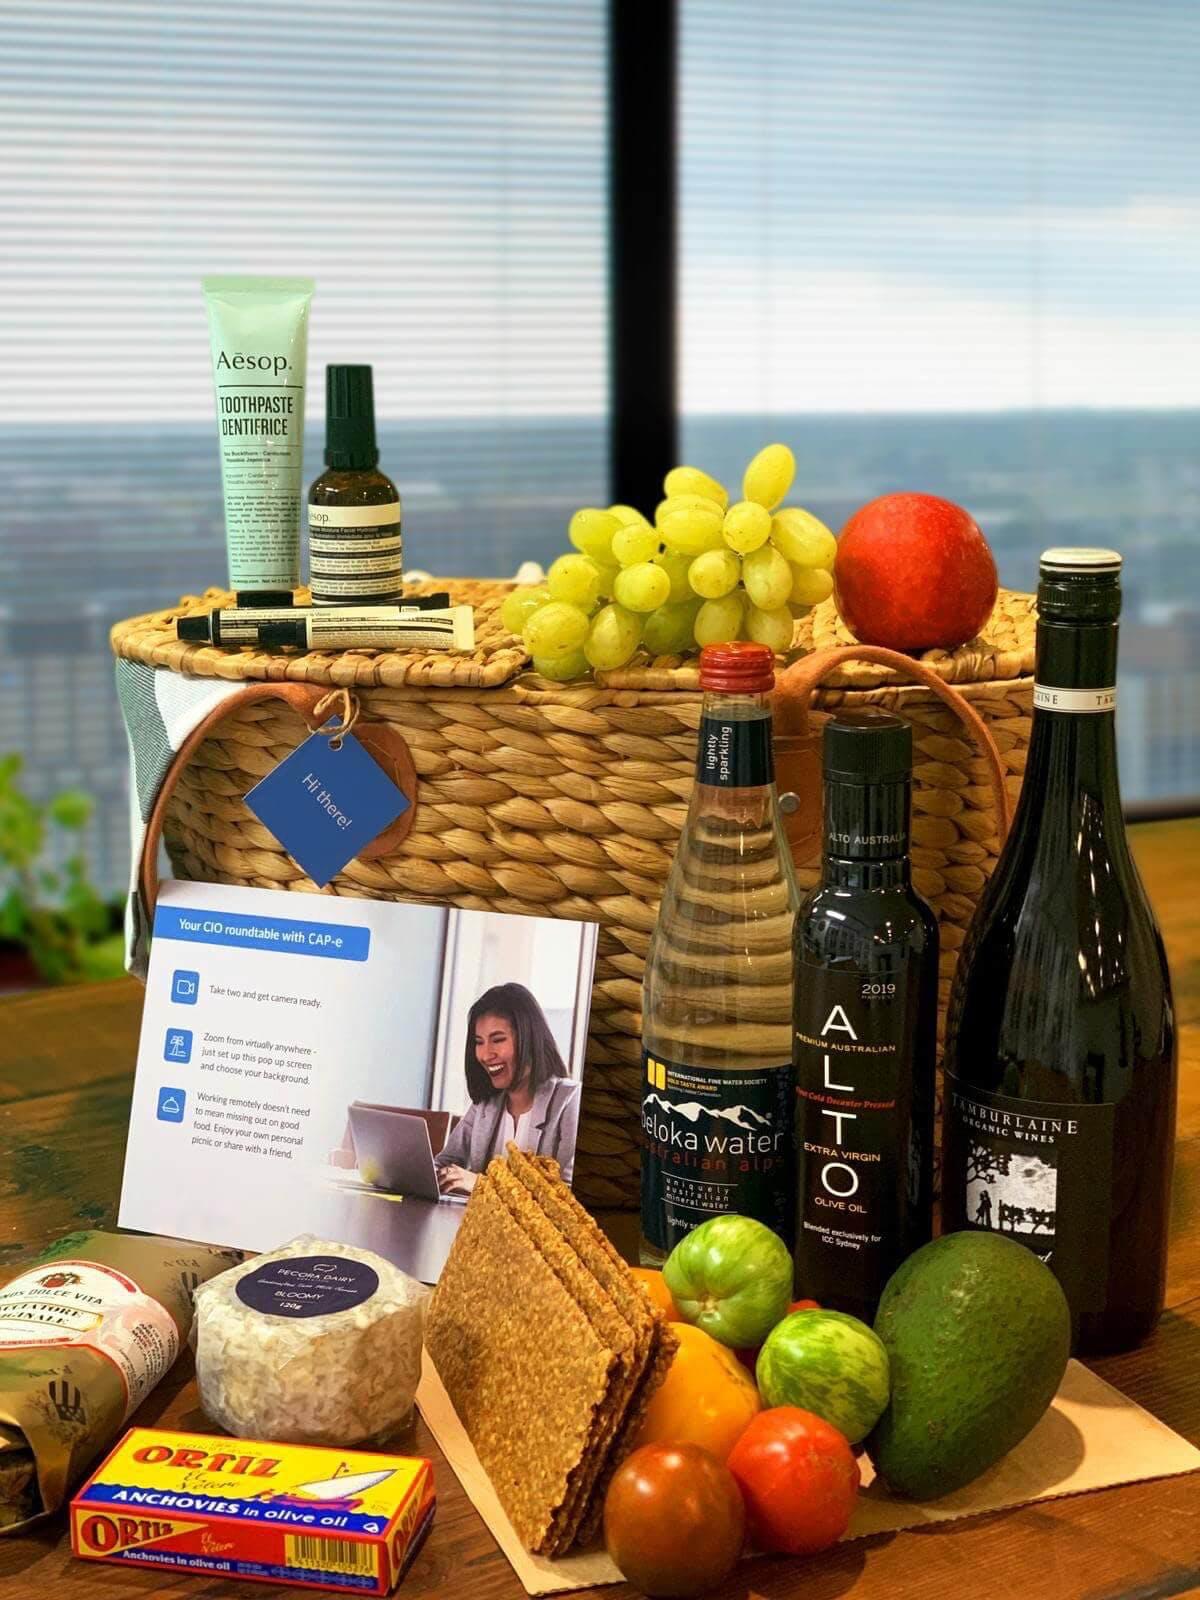 CAPITAL-e Corporate Gifting